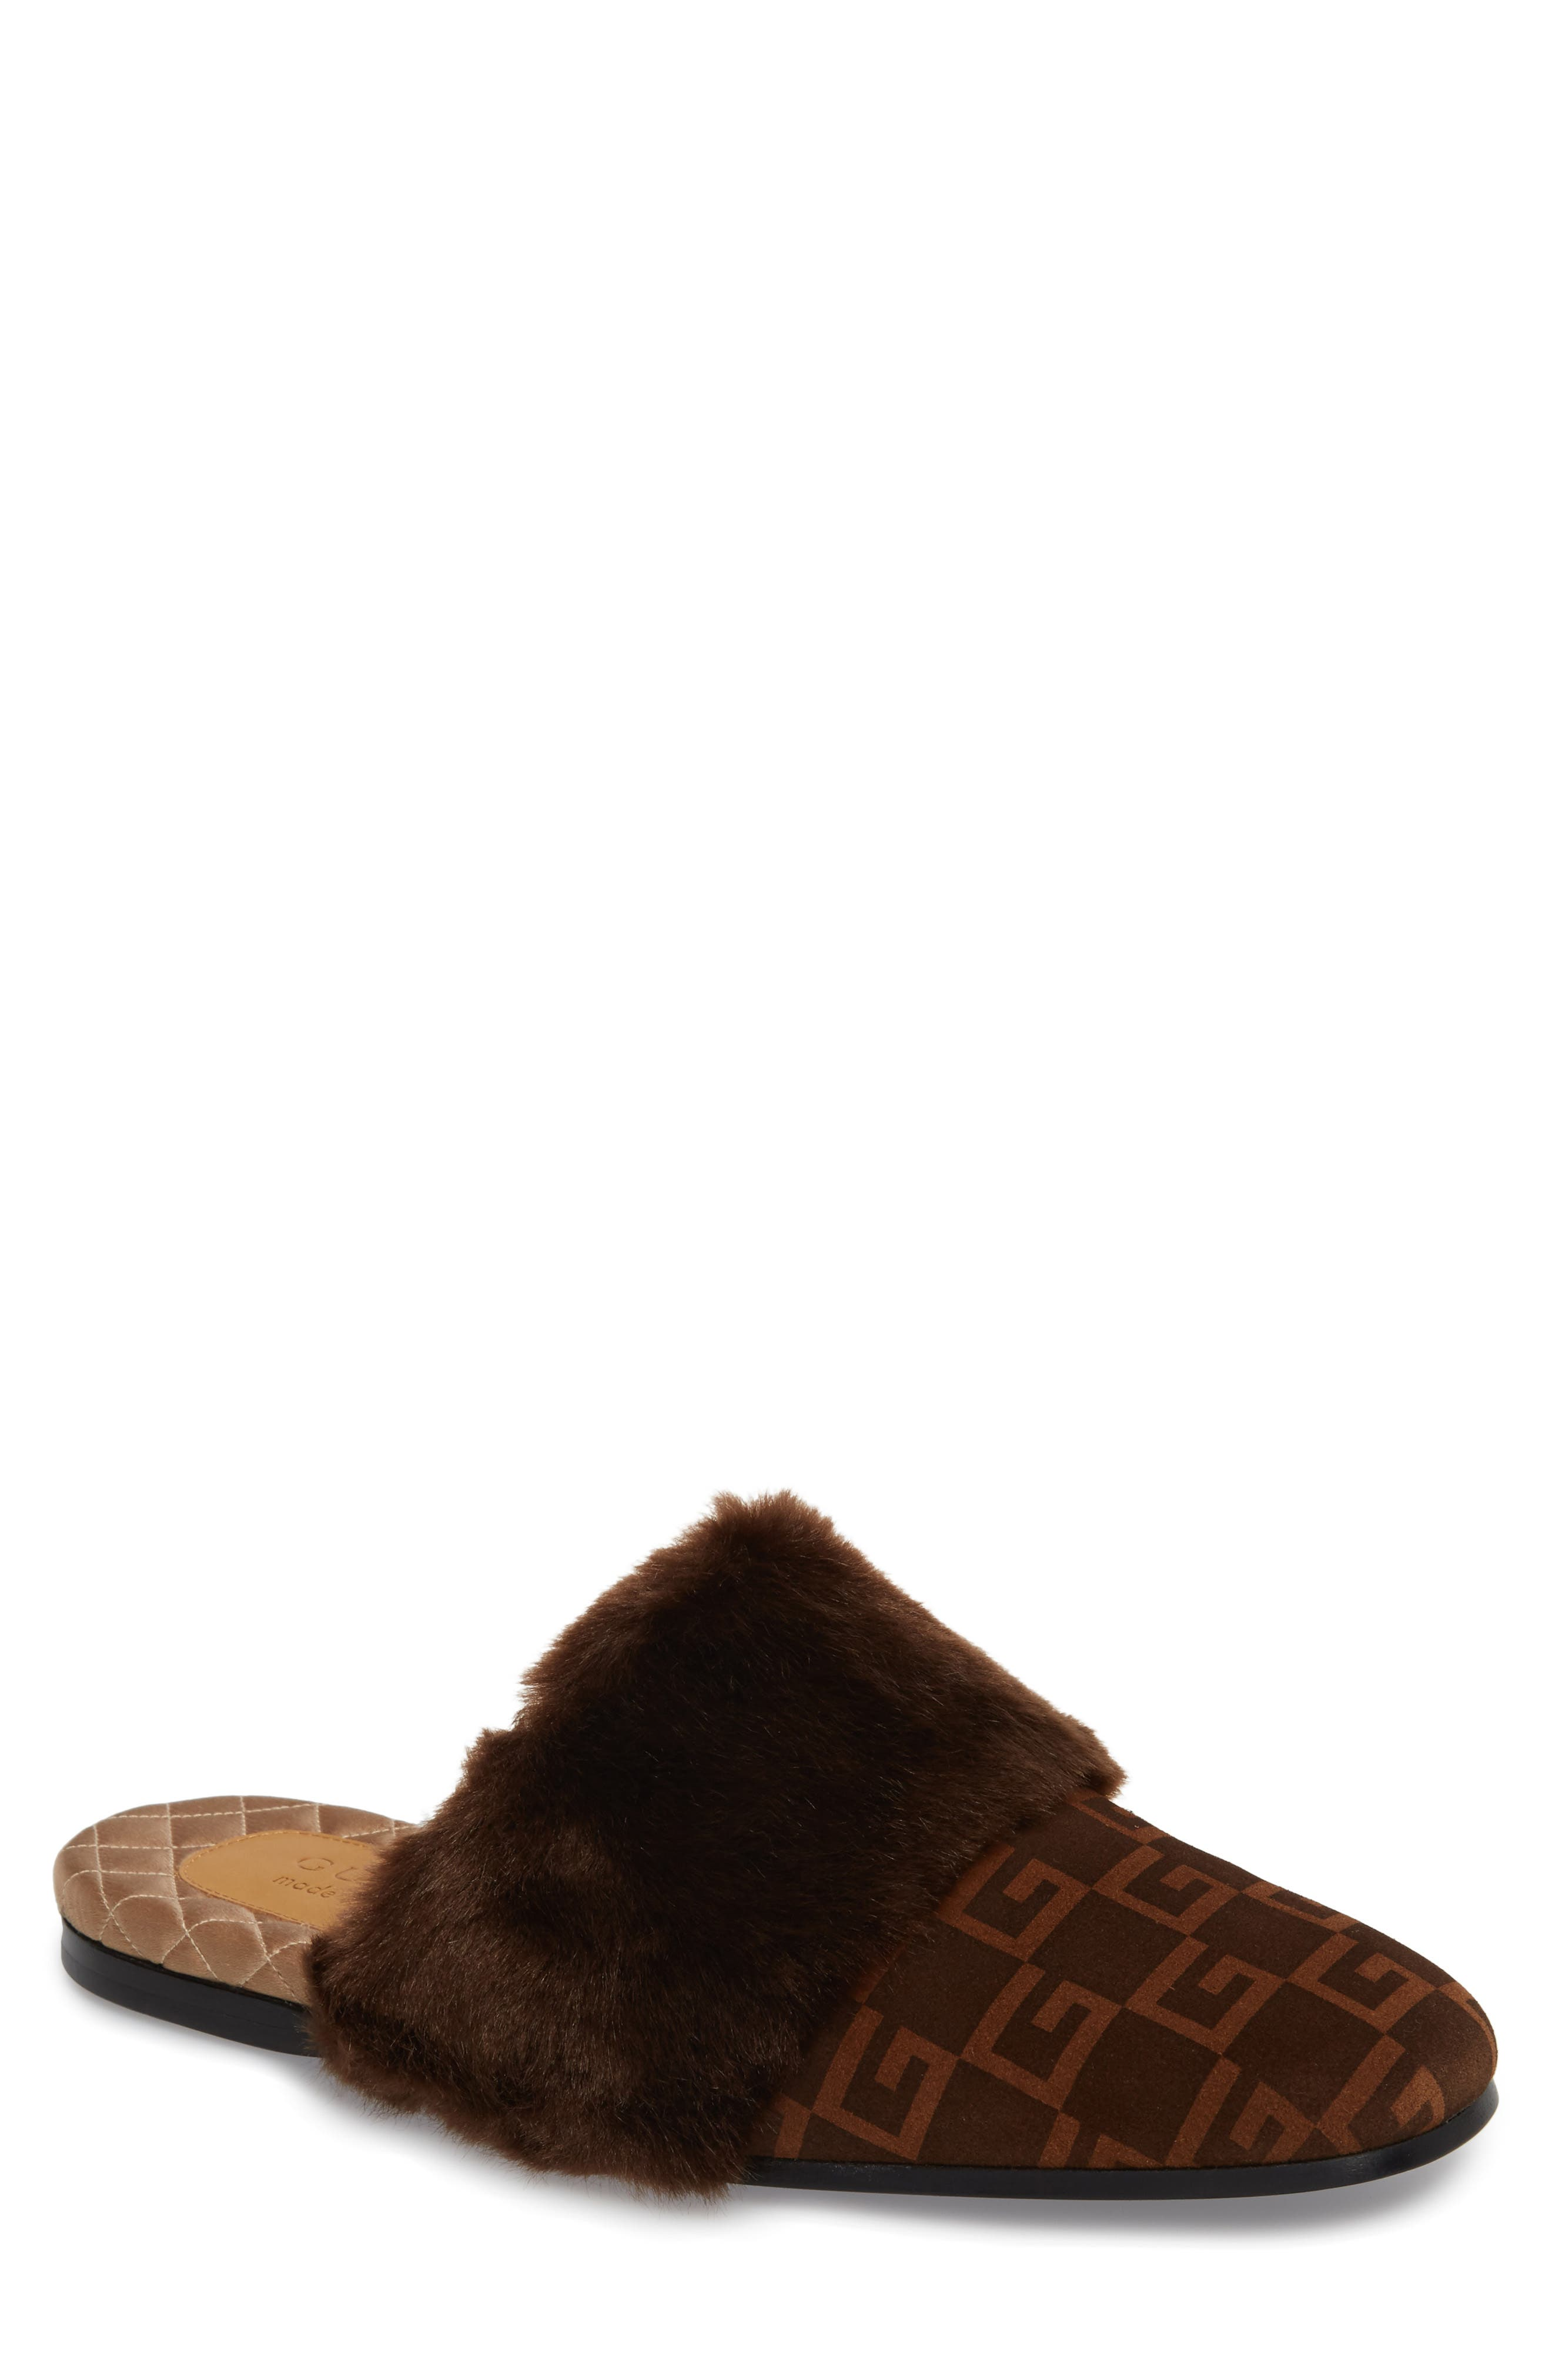 e58b20285 Buy gucci slippers for men - Best men's gucci slippers shop - Cools.com